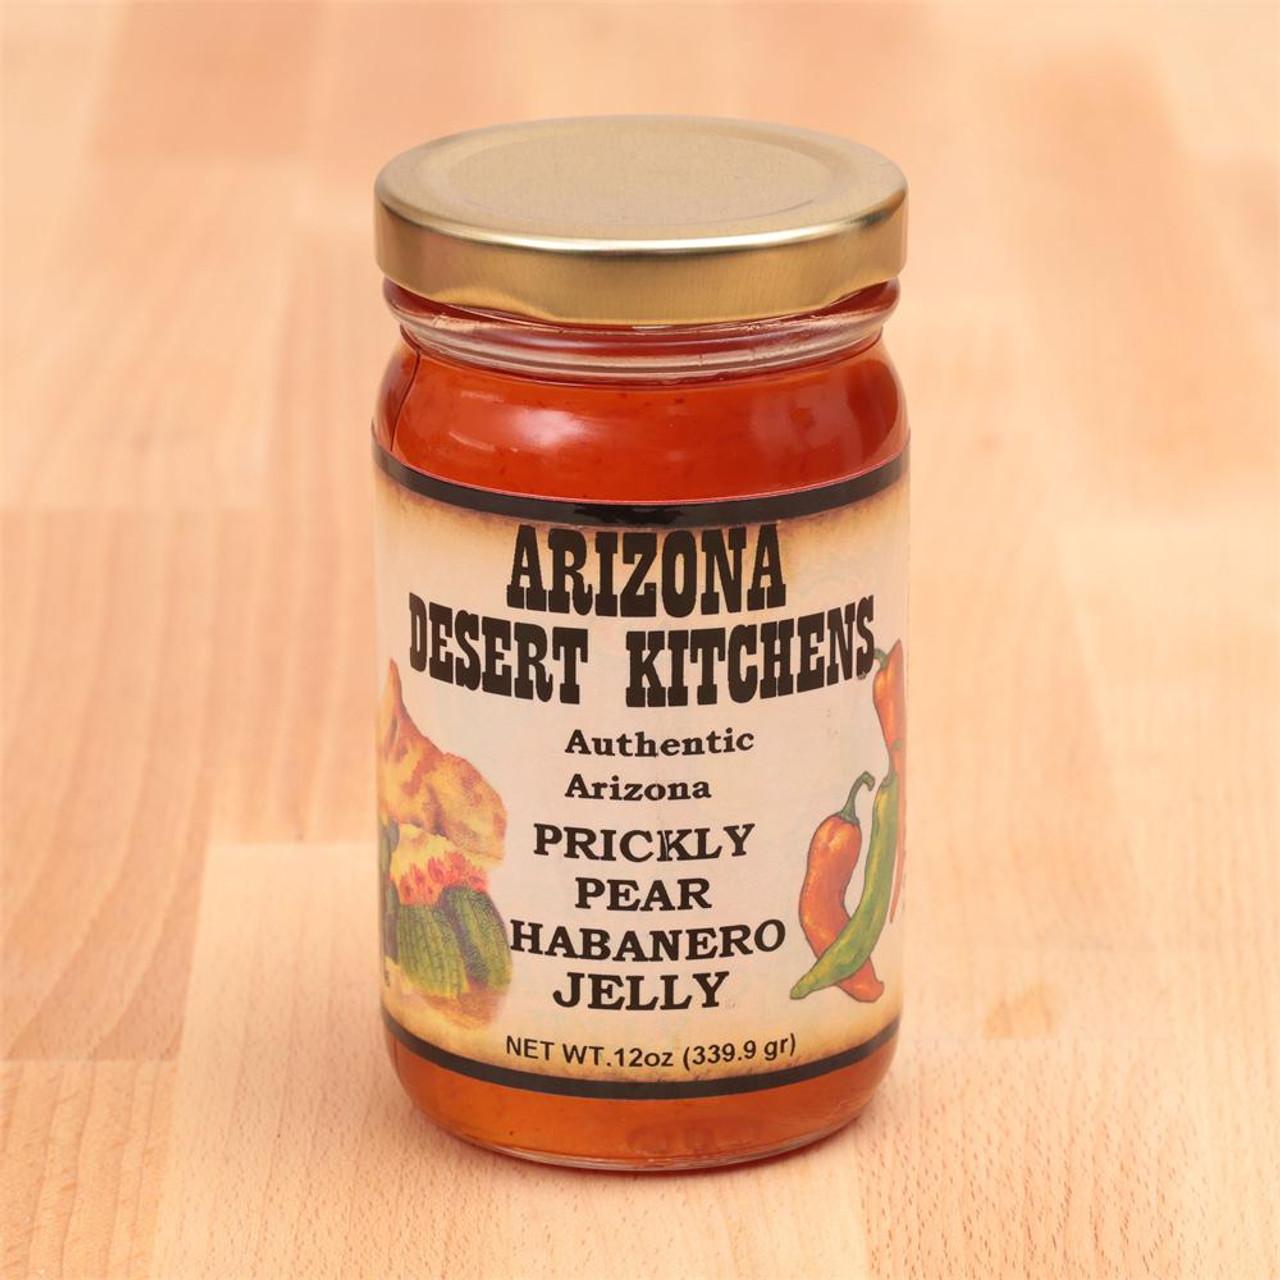 Gourmet Prickly Pear Habanero Jelly 10oz